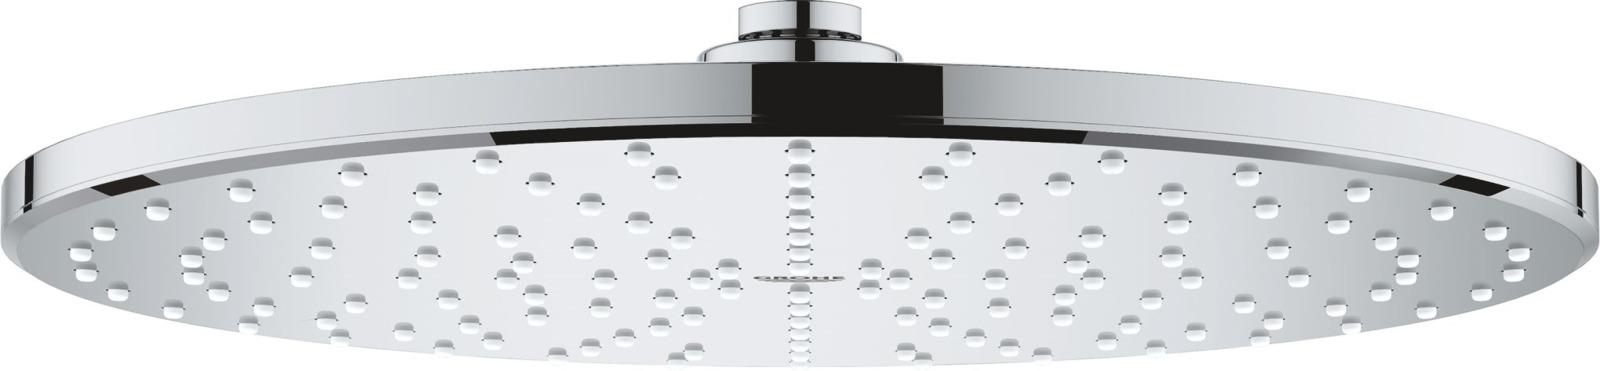 Верхний душ Grohe Rainshower 310 Mono, круглый, 1 режим, 26562000, серебристый, диаметр 31 см